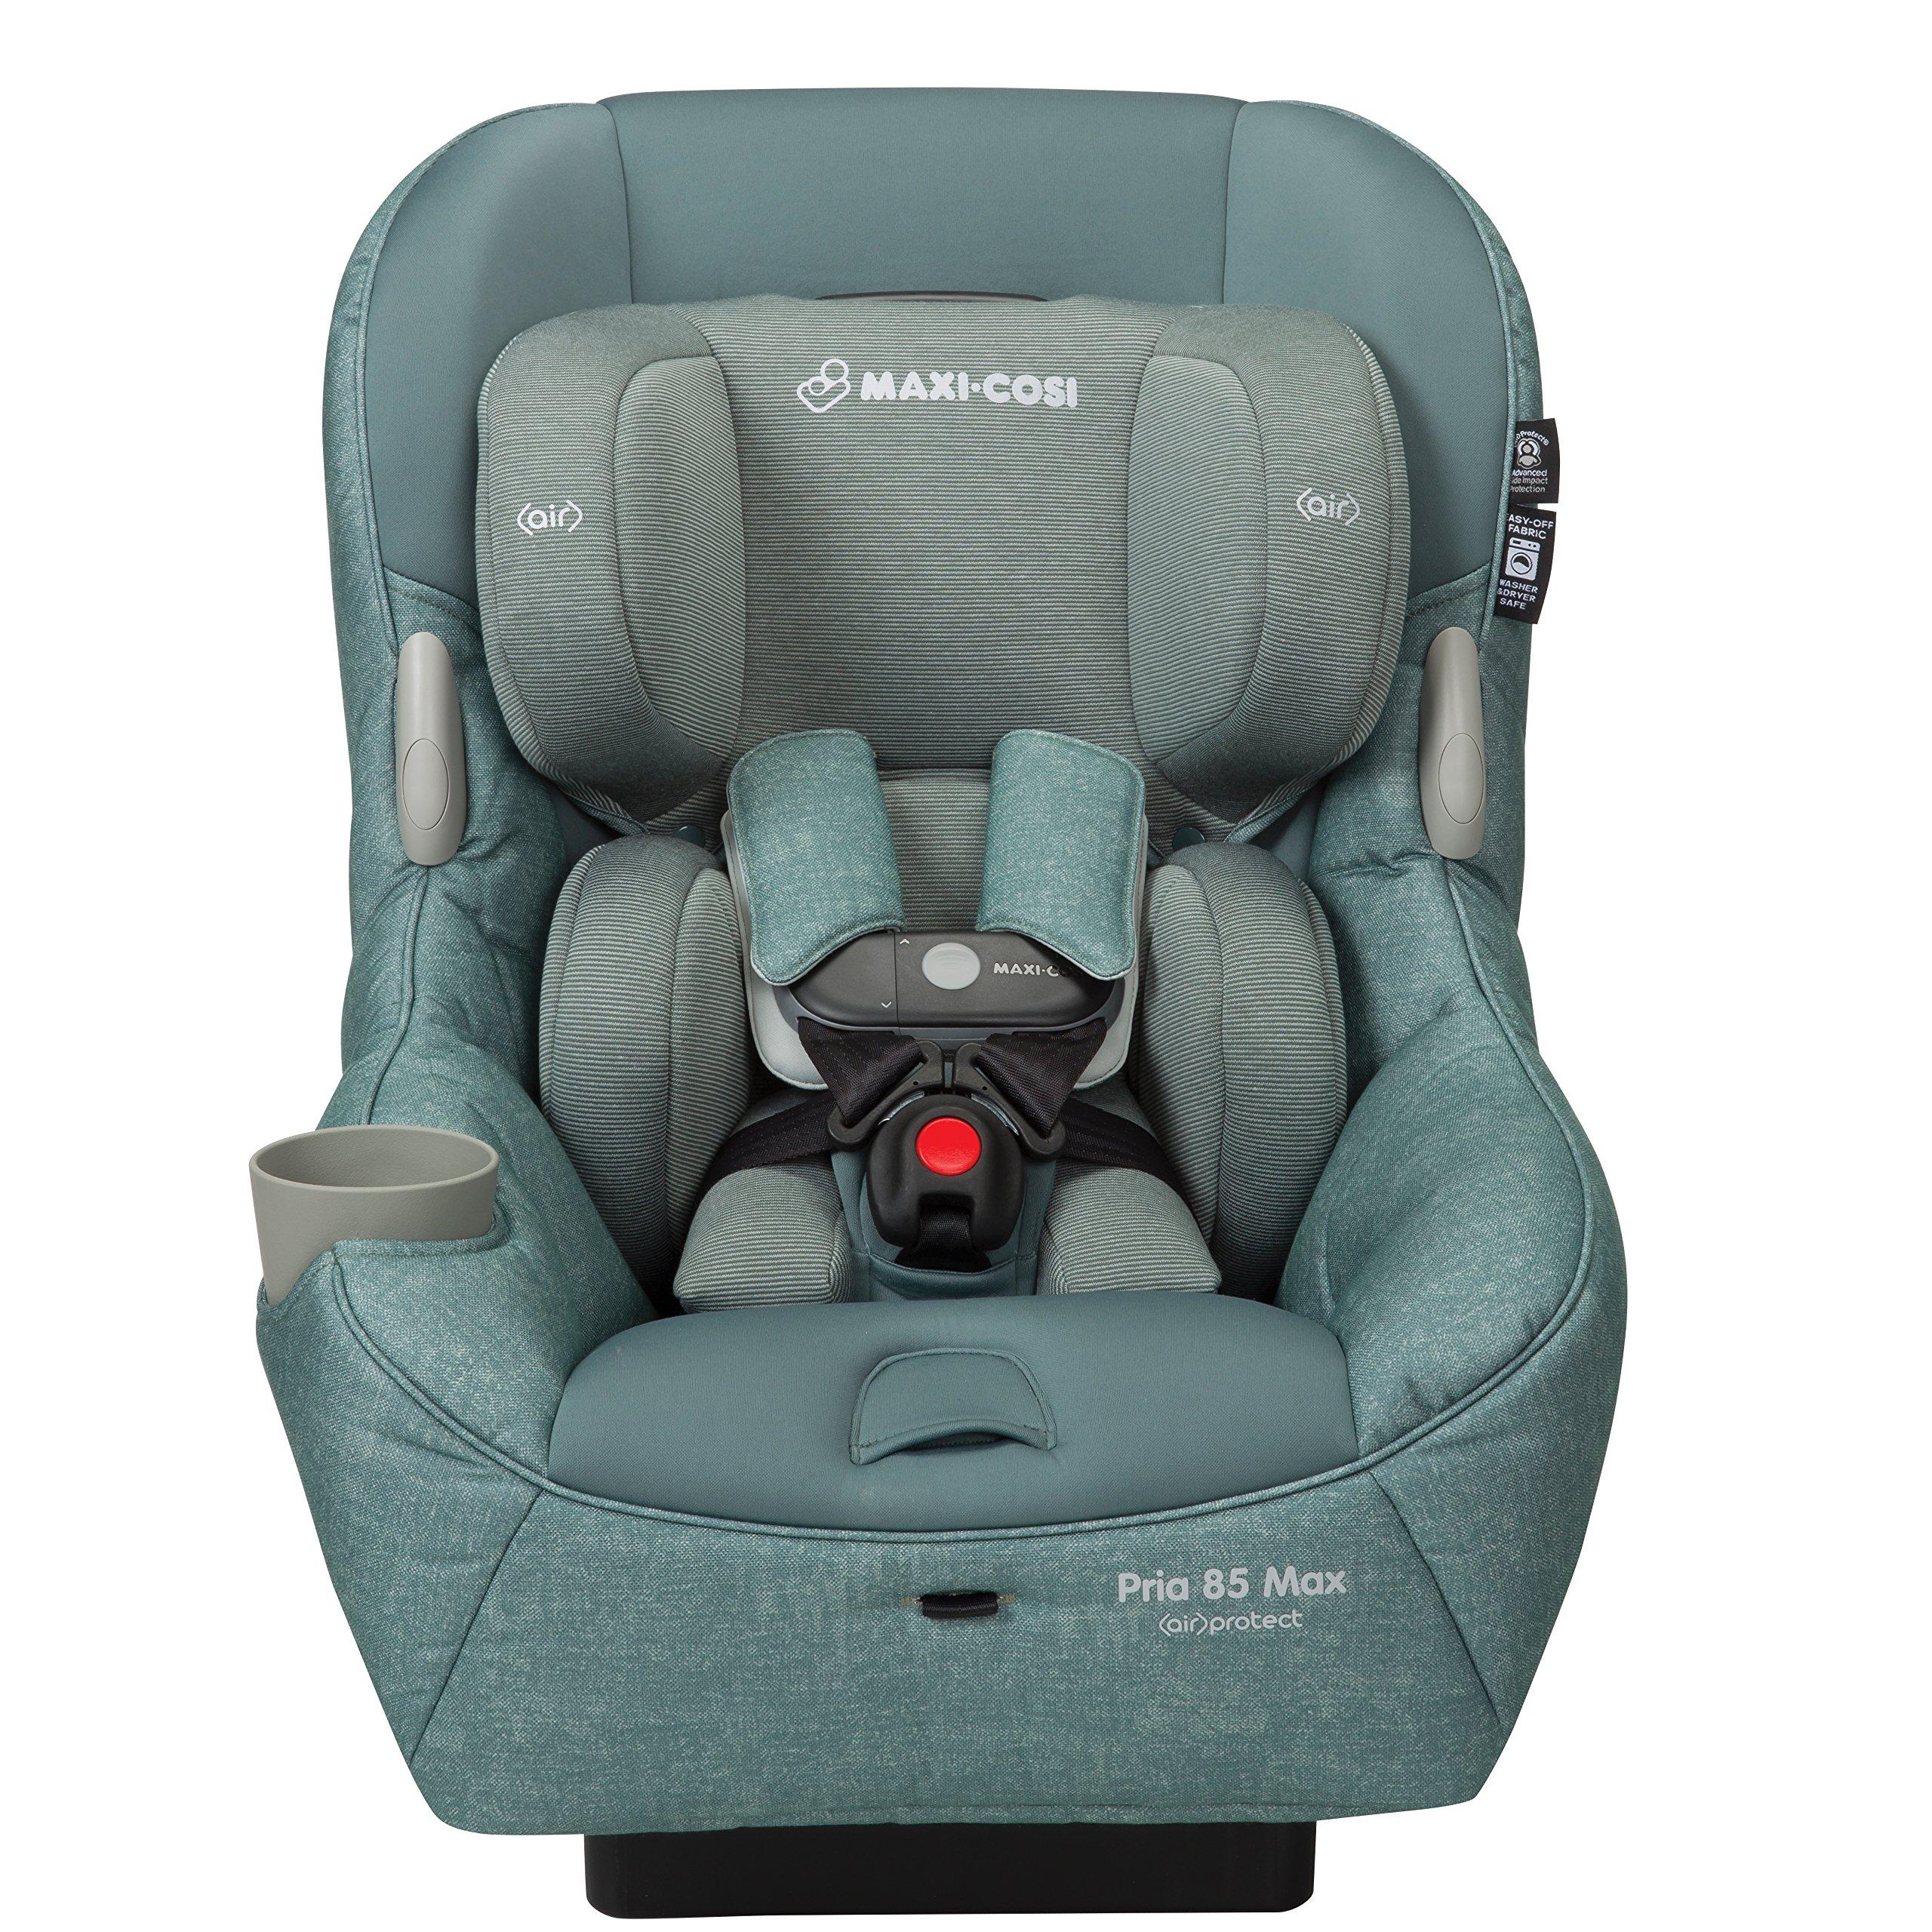 Maxi-Cosi Pria 85 Max Convertible Car Seat, Nomad Green